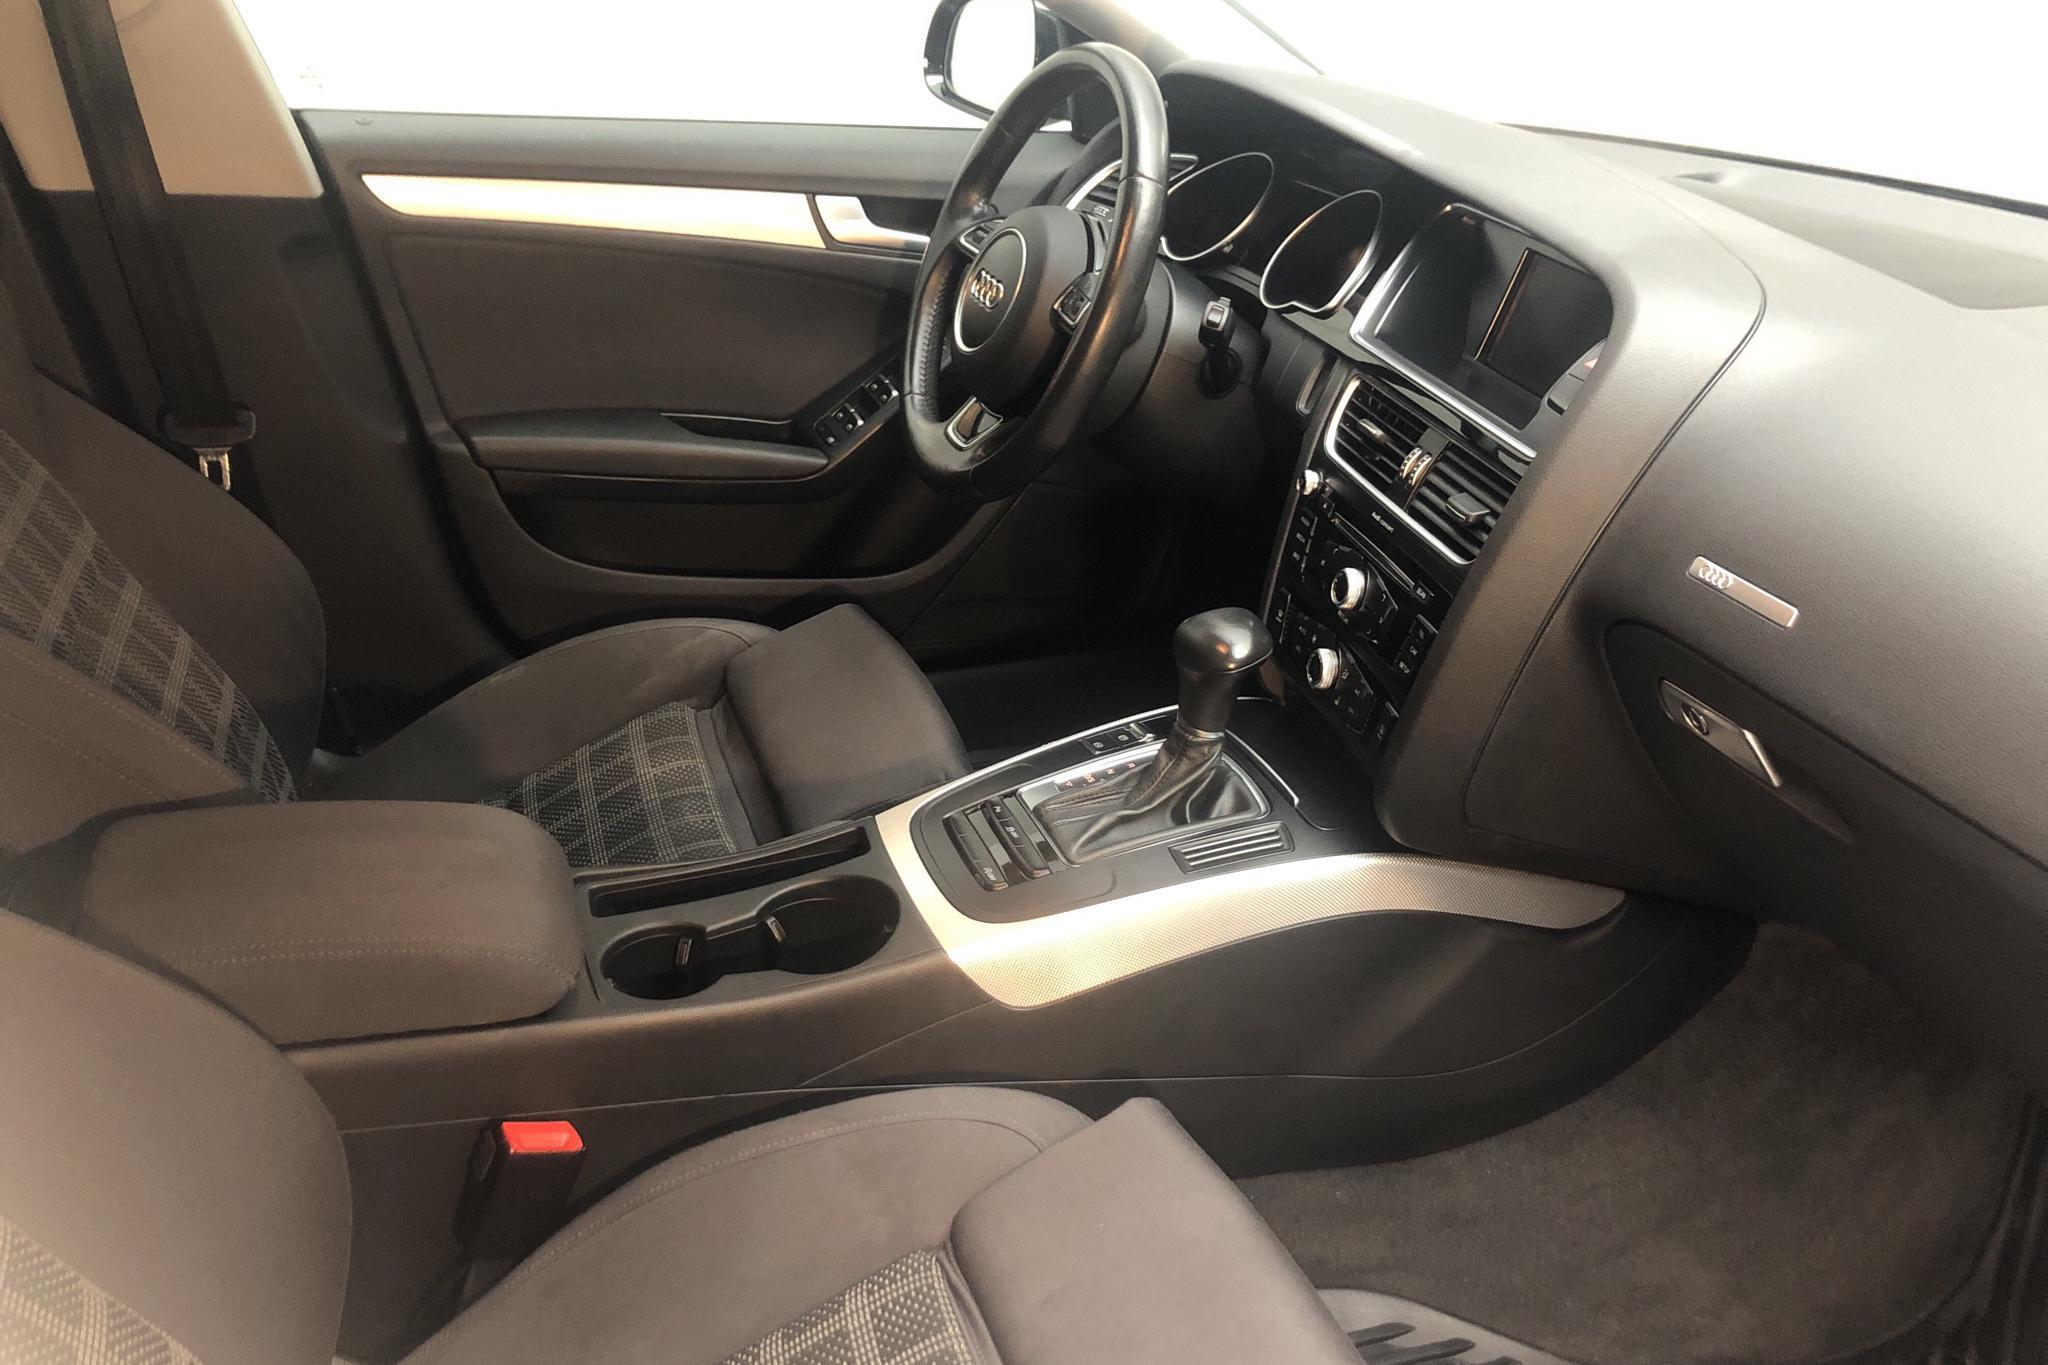 Audi A5 1.8 TFSI Sportback (177hk) - 7 718 mil - Automat - svart - 2016